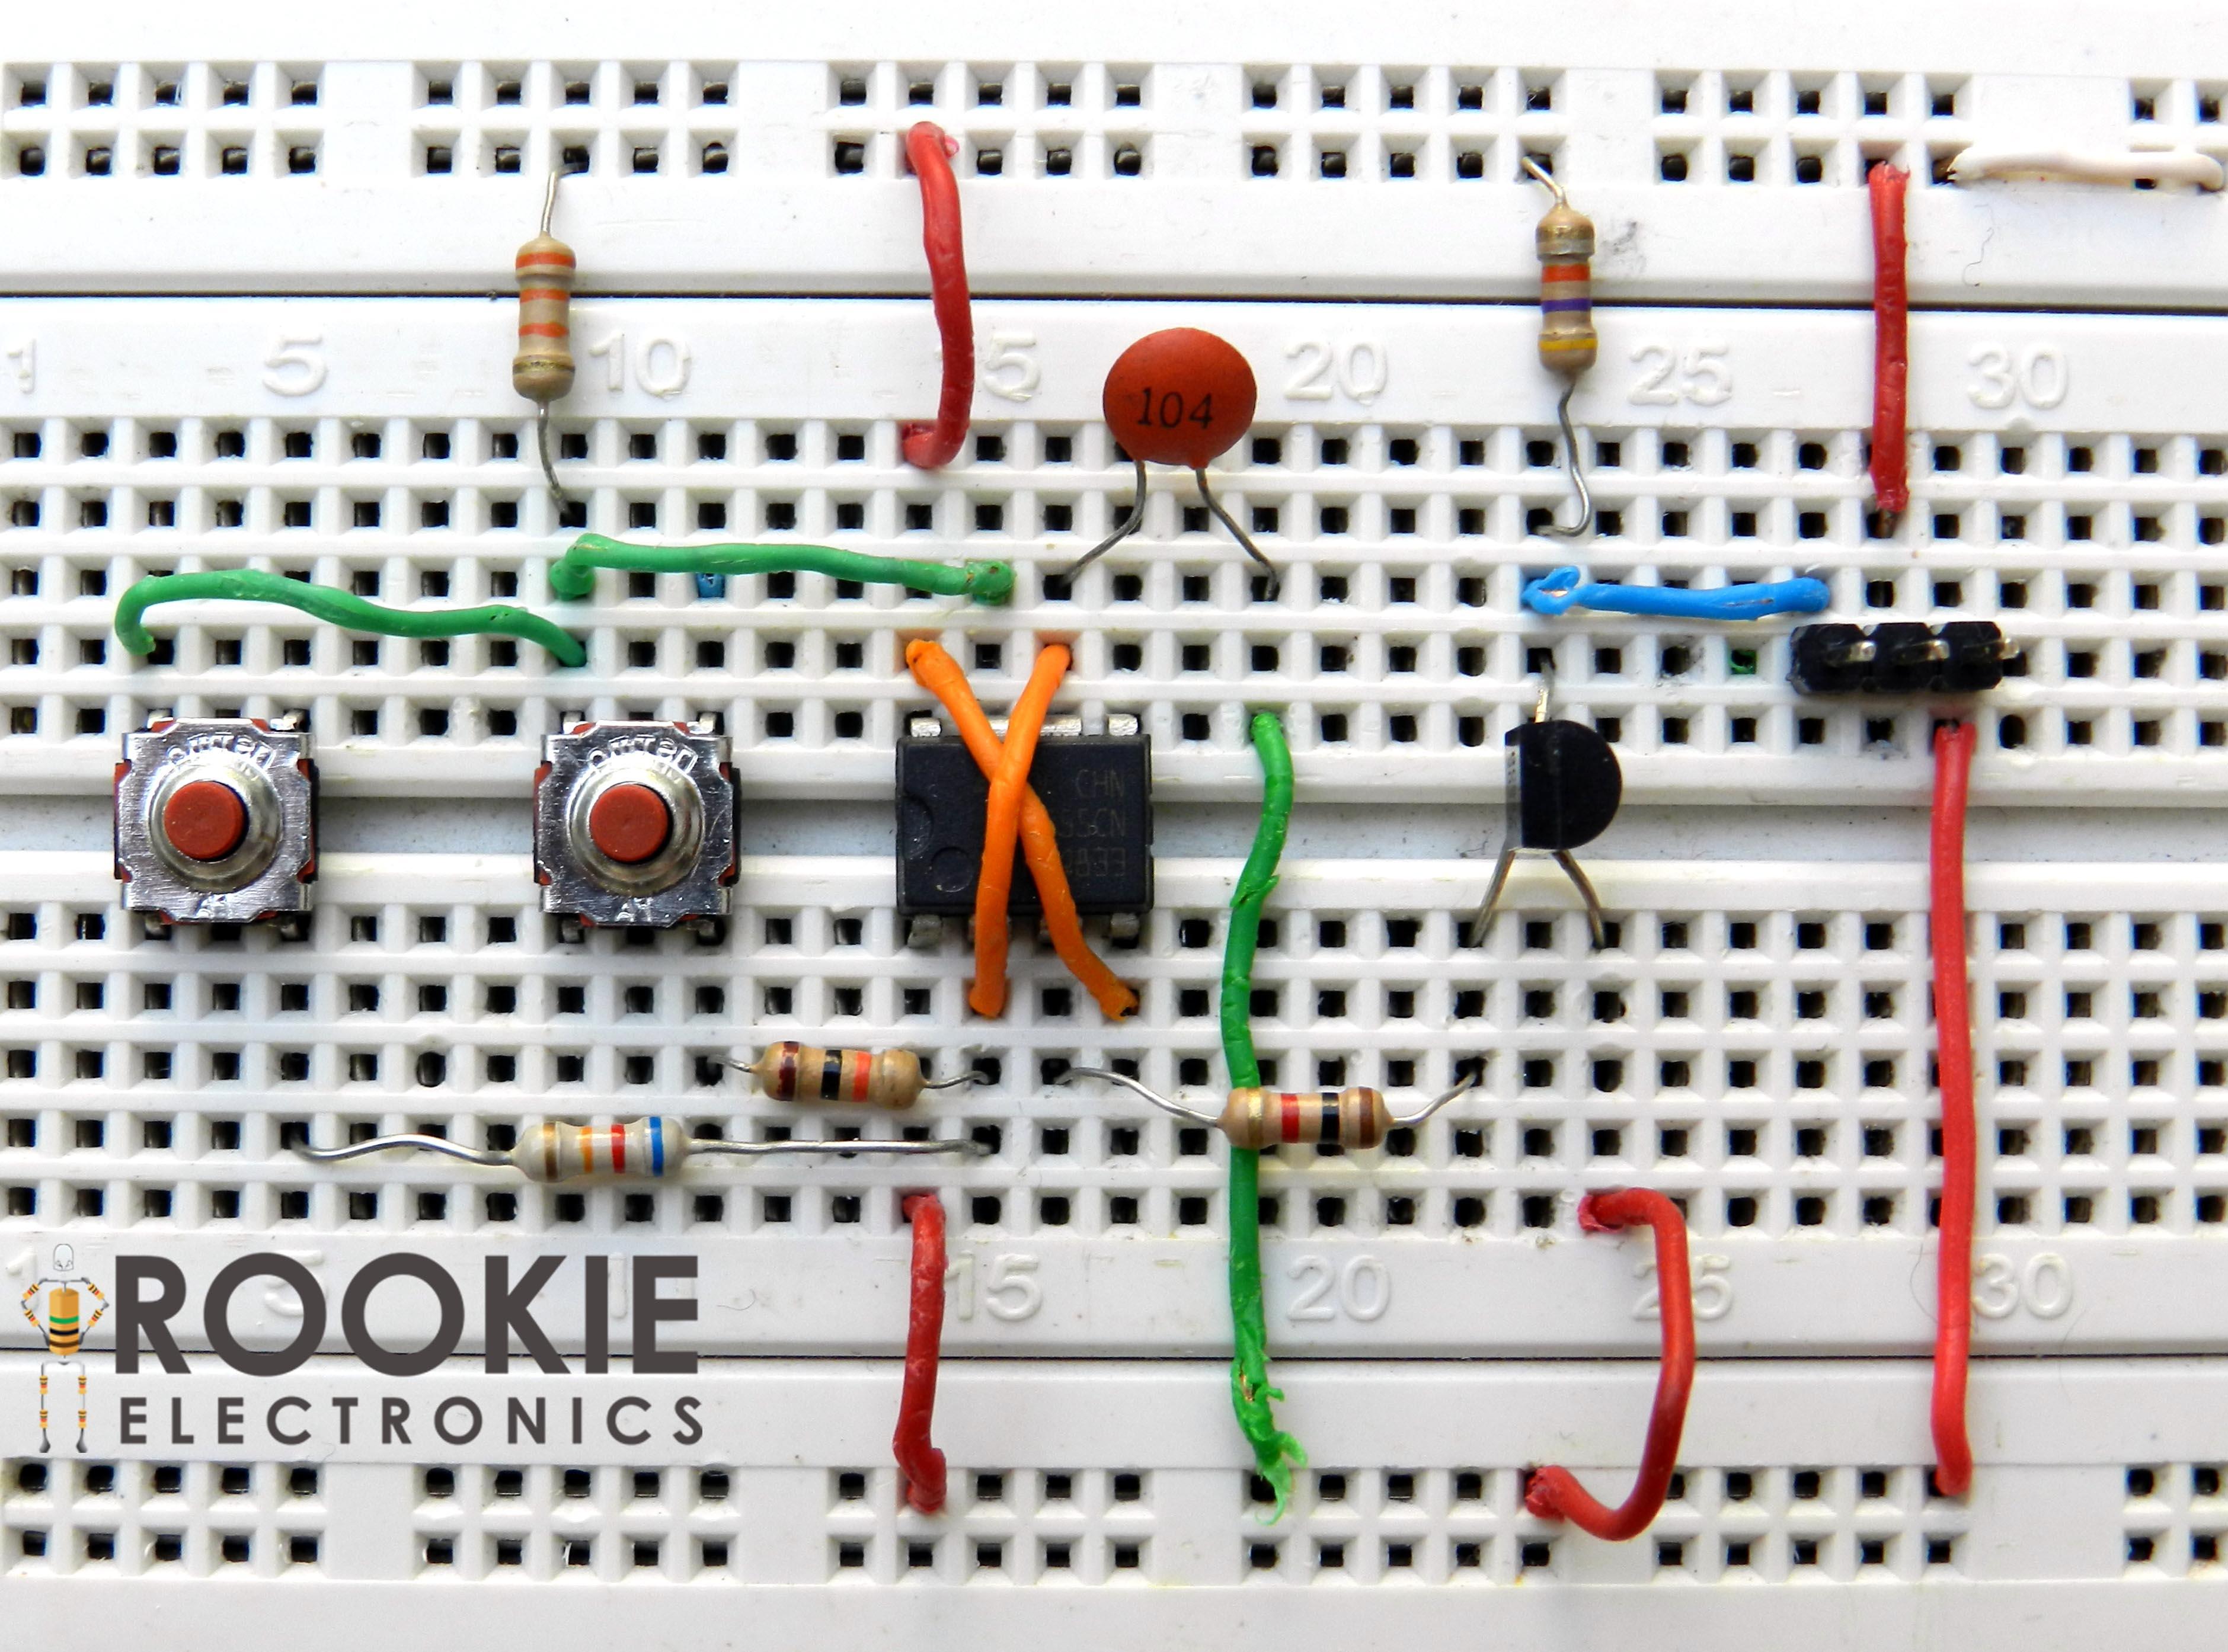 Servo Speed Tester Rookie Electronics Robotics Flasher Circuit Using Ne555 Timer Basic Electronic Project Projects